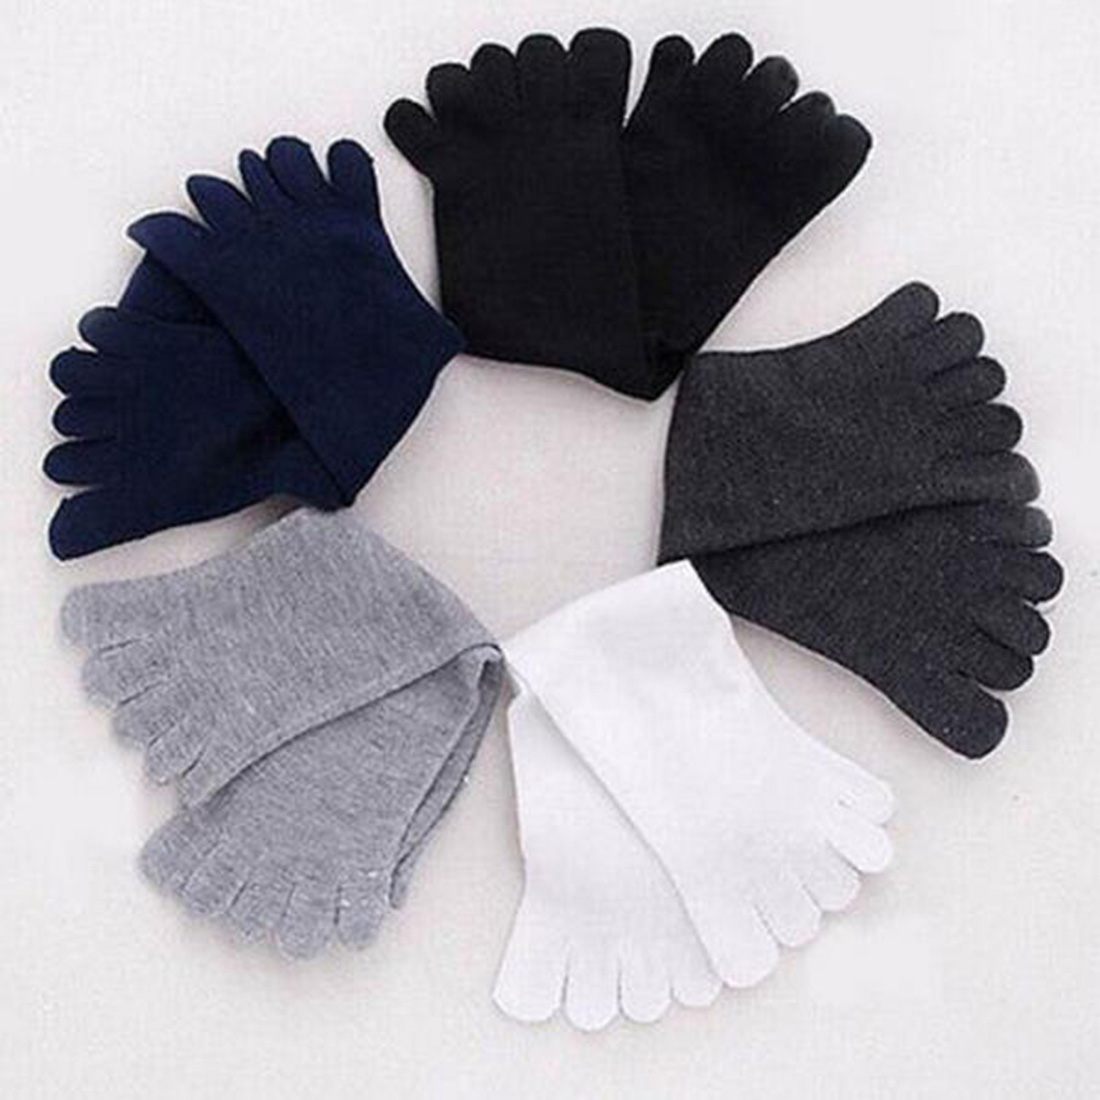 AM/_ 1 PAIR MEN/'S WINTER WARM THERMAL CASUAL SPORTS SOFT TOE SOCKS FINGERSOCKS OR